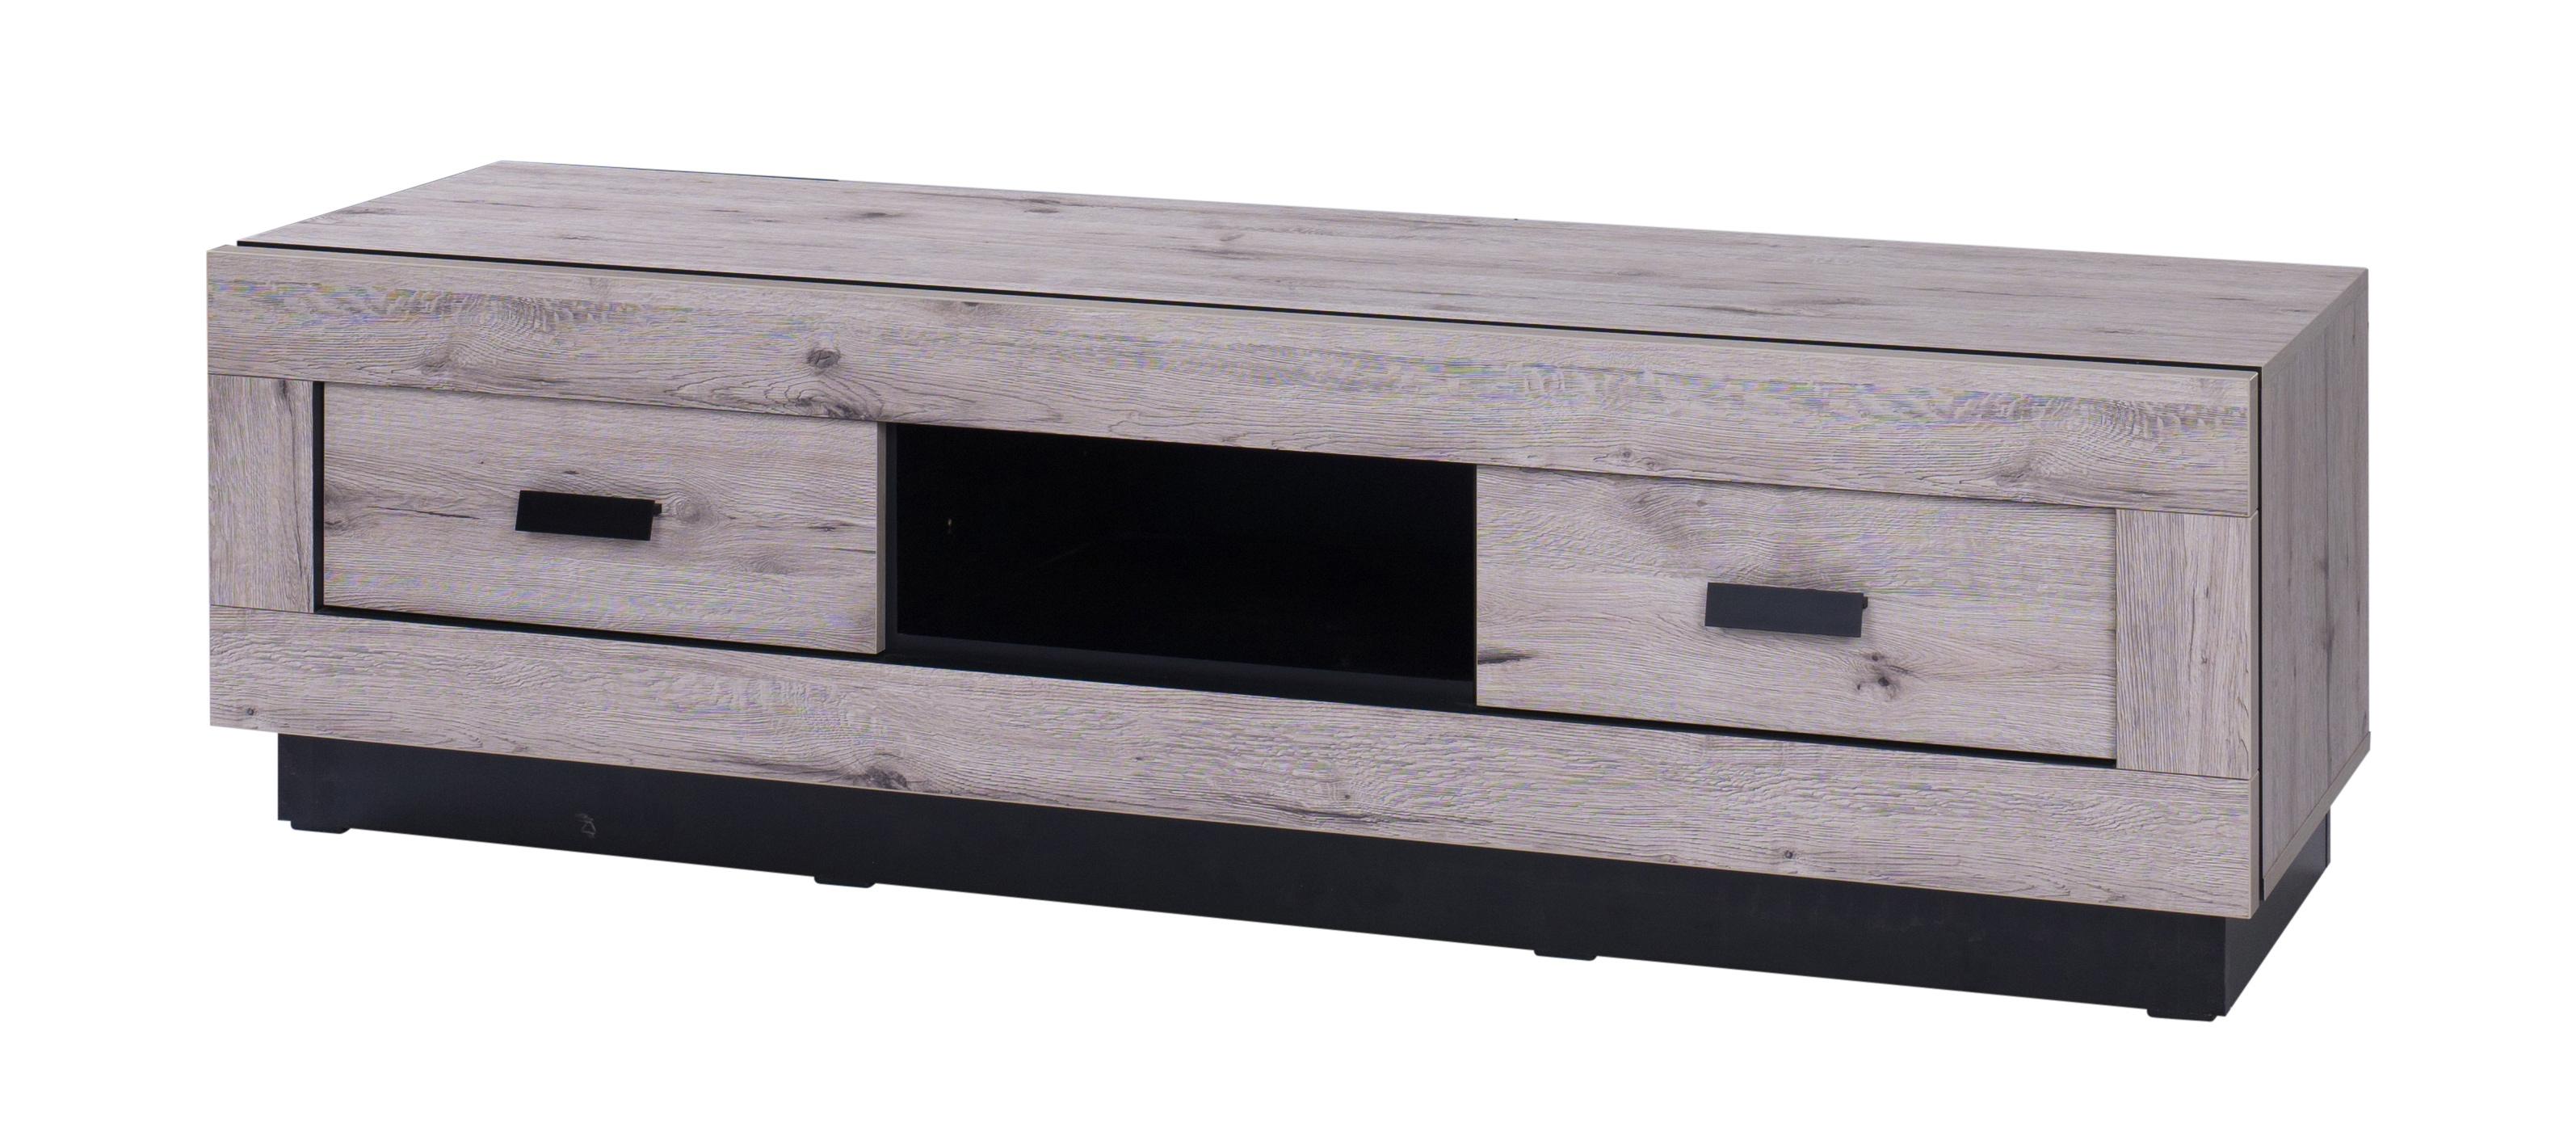 Meuble TV contemporain 170 cm chêne wellington Marbella